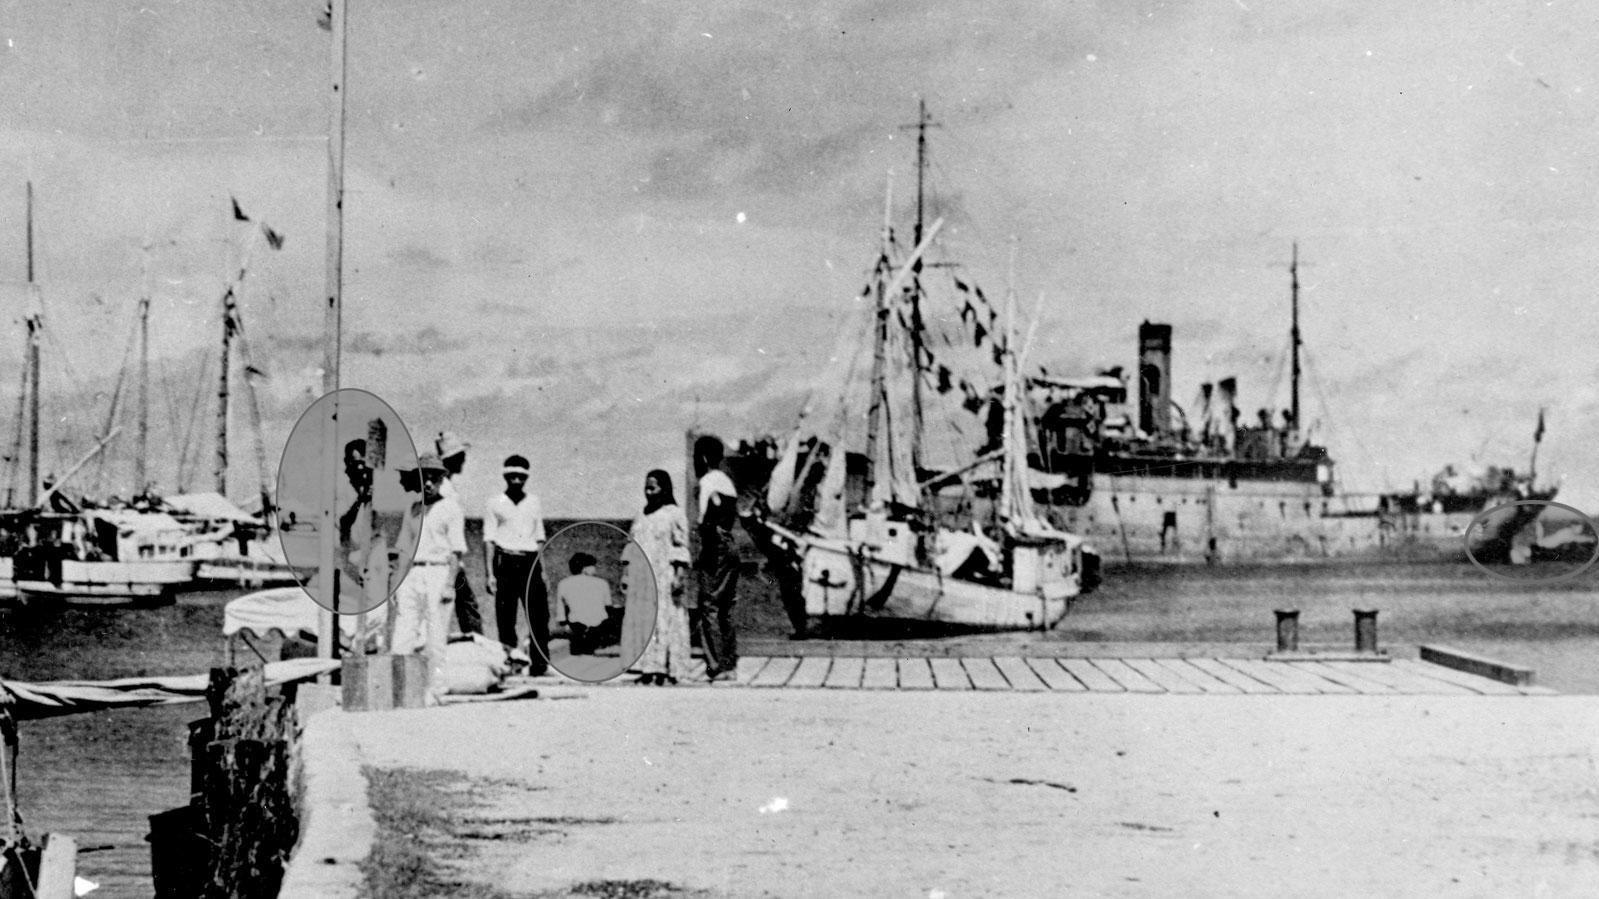 HISTORY CHANNEL mener at dette bildet viser Fred Noonan og Amelia Earhart.